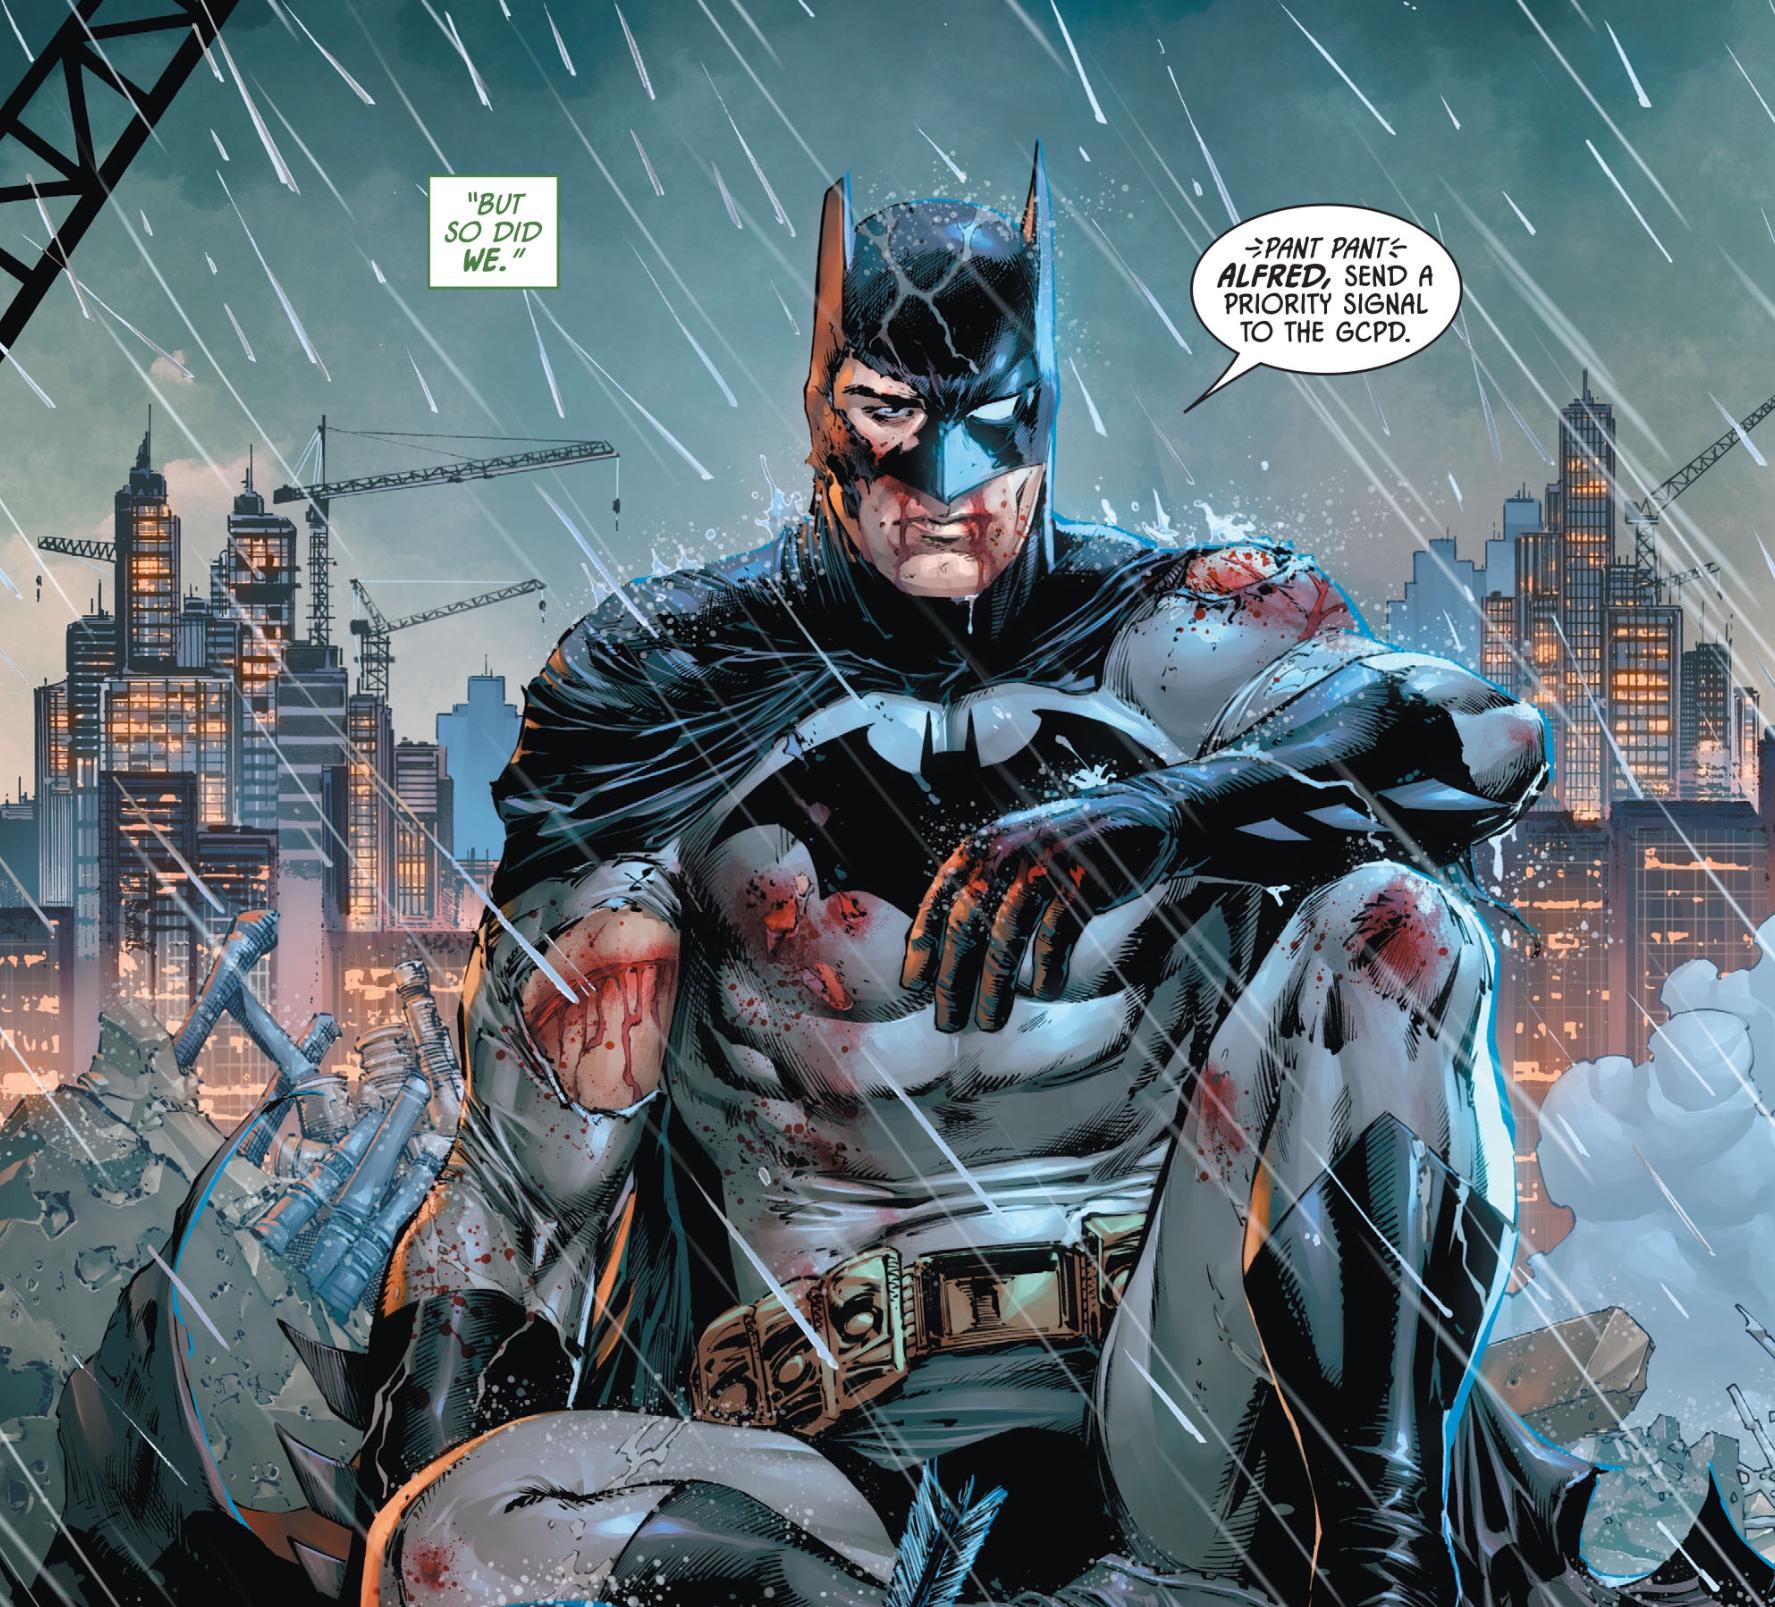 DC's pivotal, new Batman comic teases a fresh beginning for the Joker, too